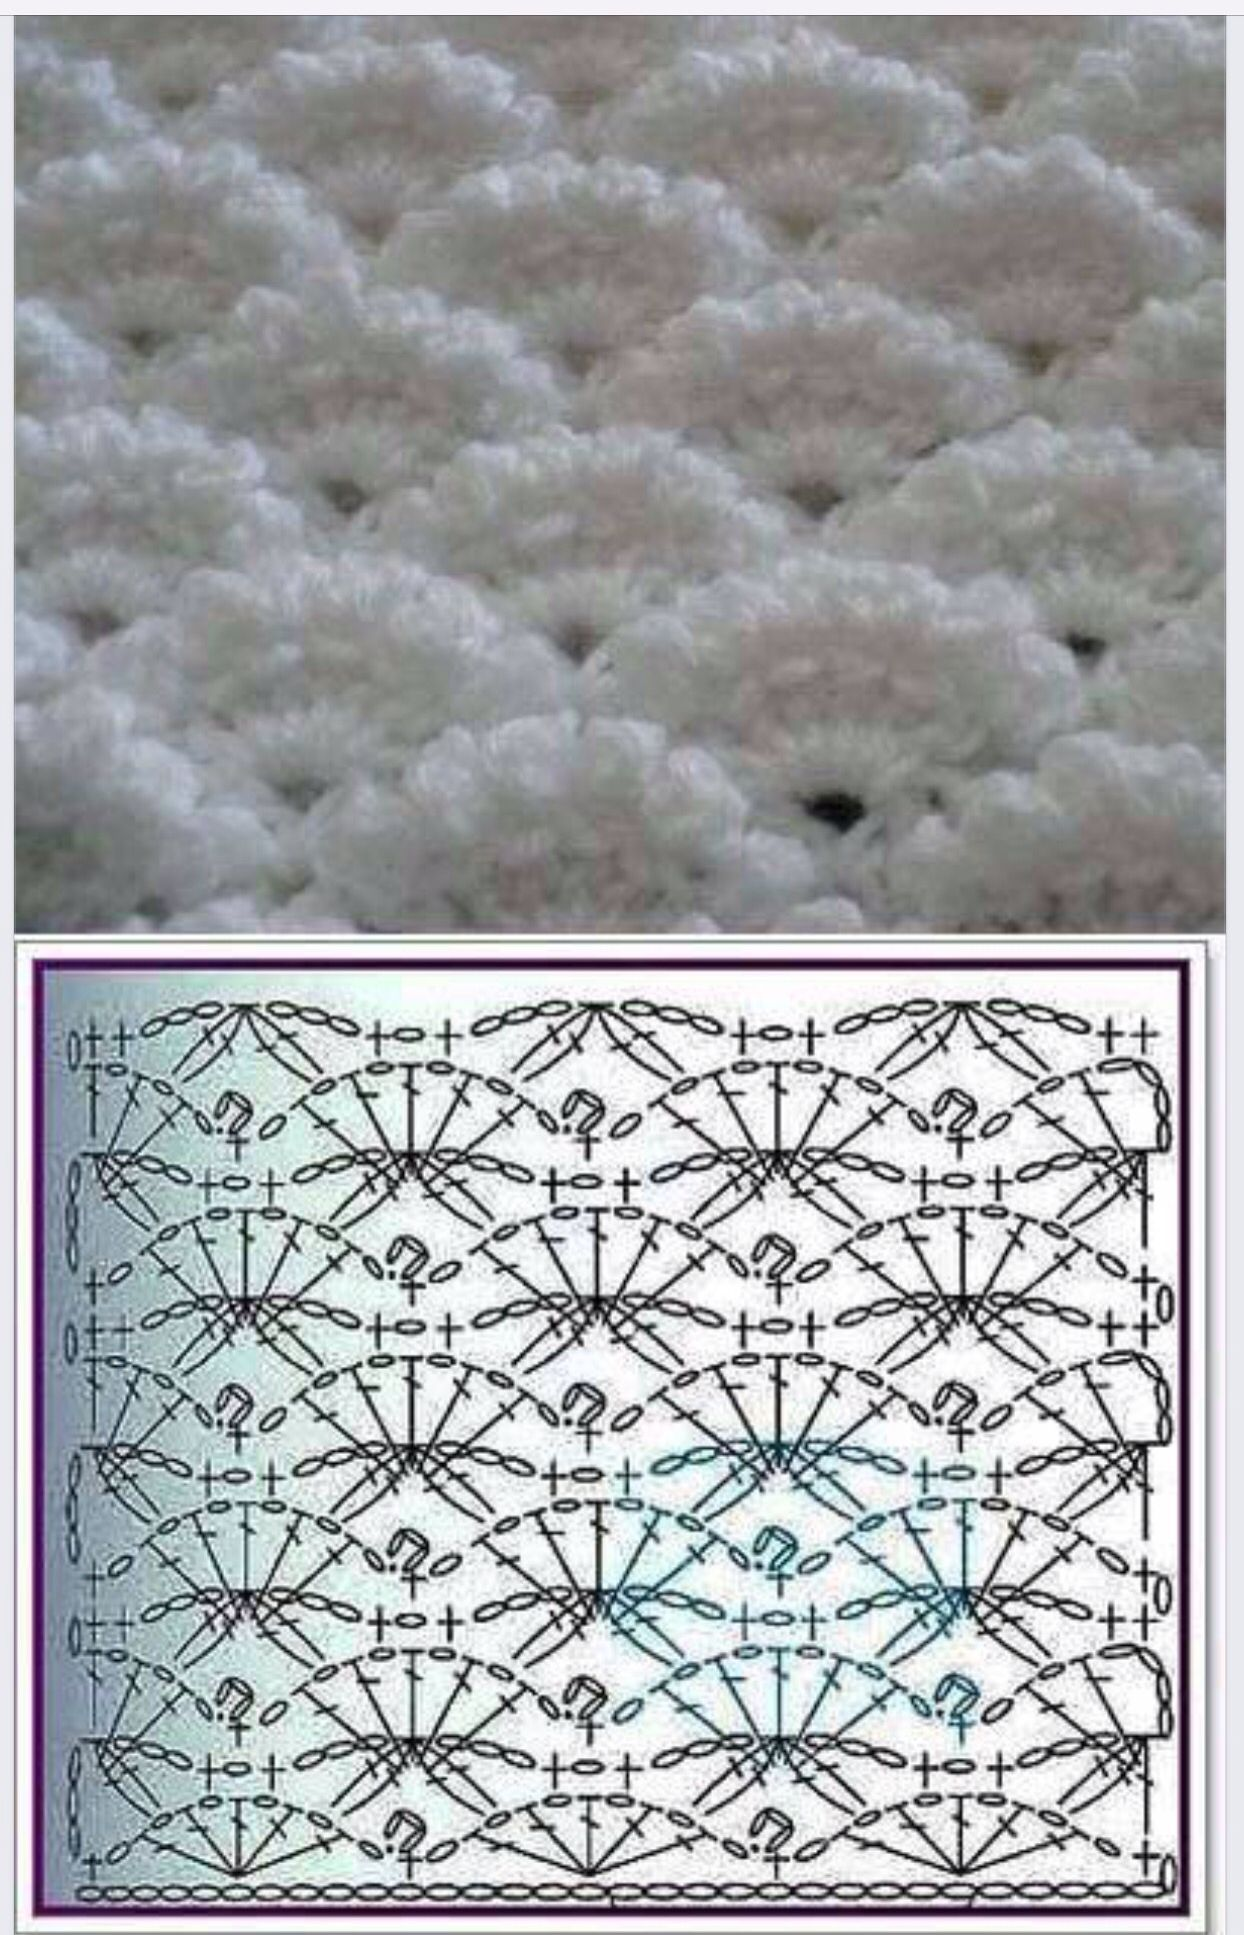 Pin de Anette Potgieter en crochet diy anette | Pinterest | Patrones ...